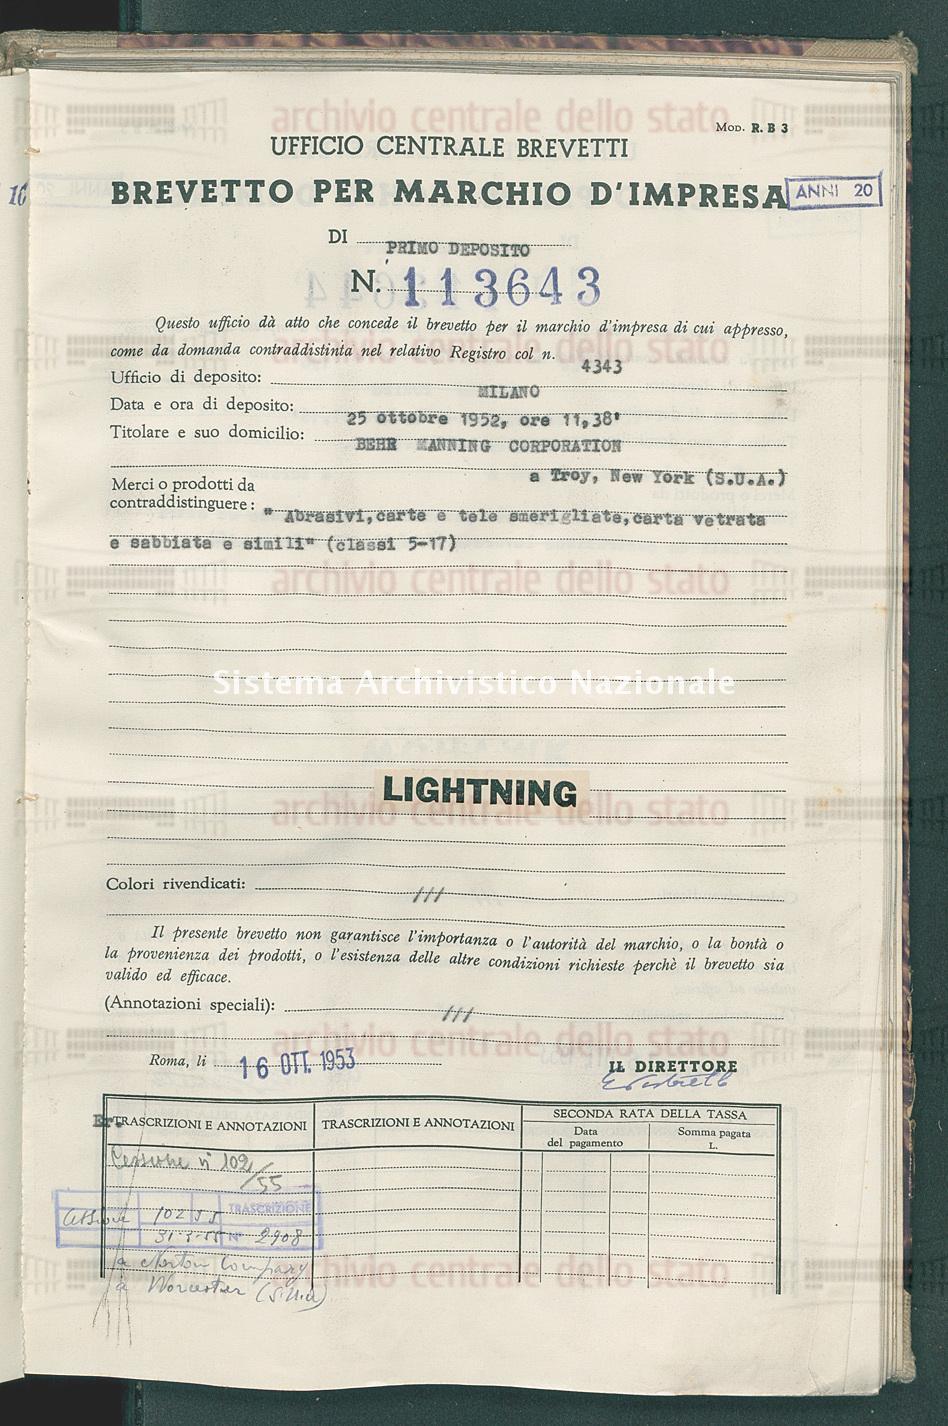 'Abrasivi, carte e tele smerigliate, carta vetrata e sabbiata e simili Behr Manning Corporation (16/10/1953)